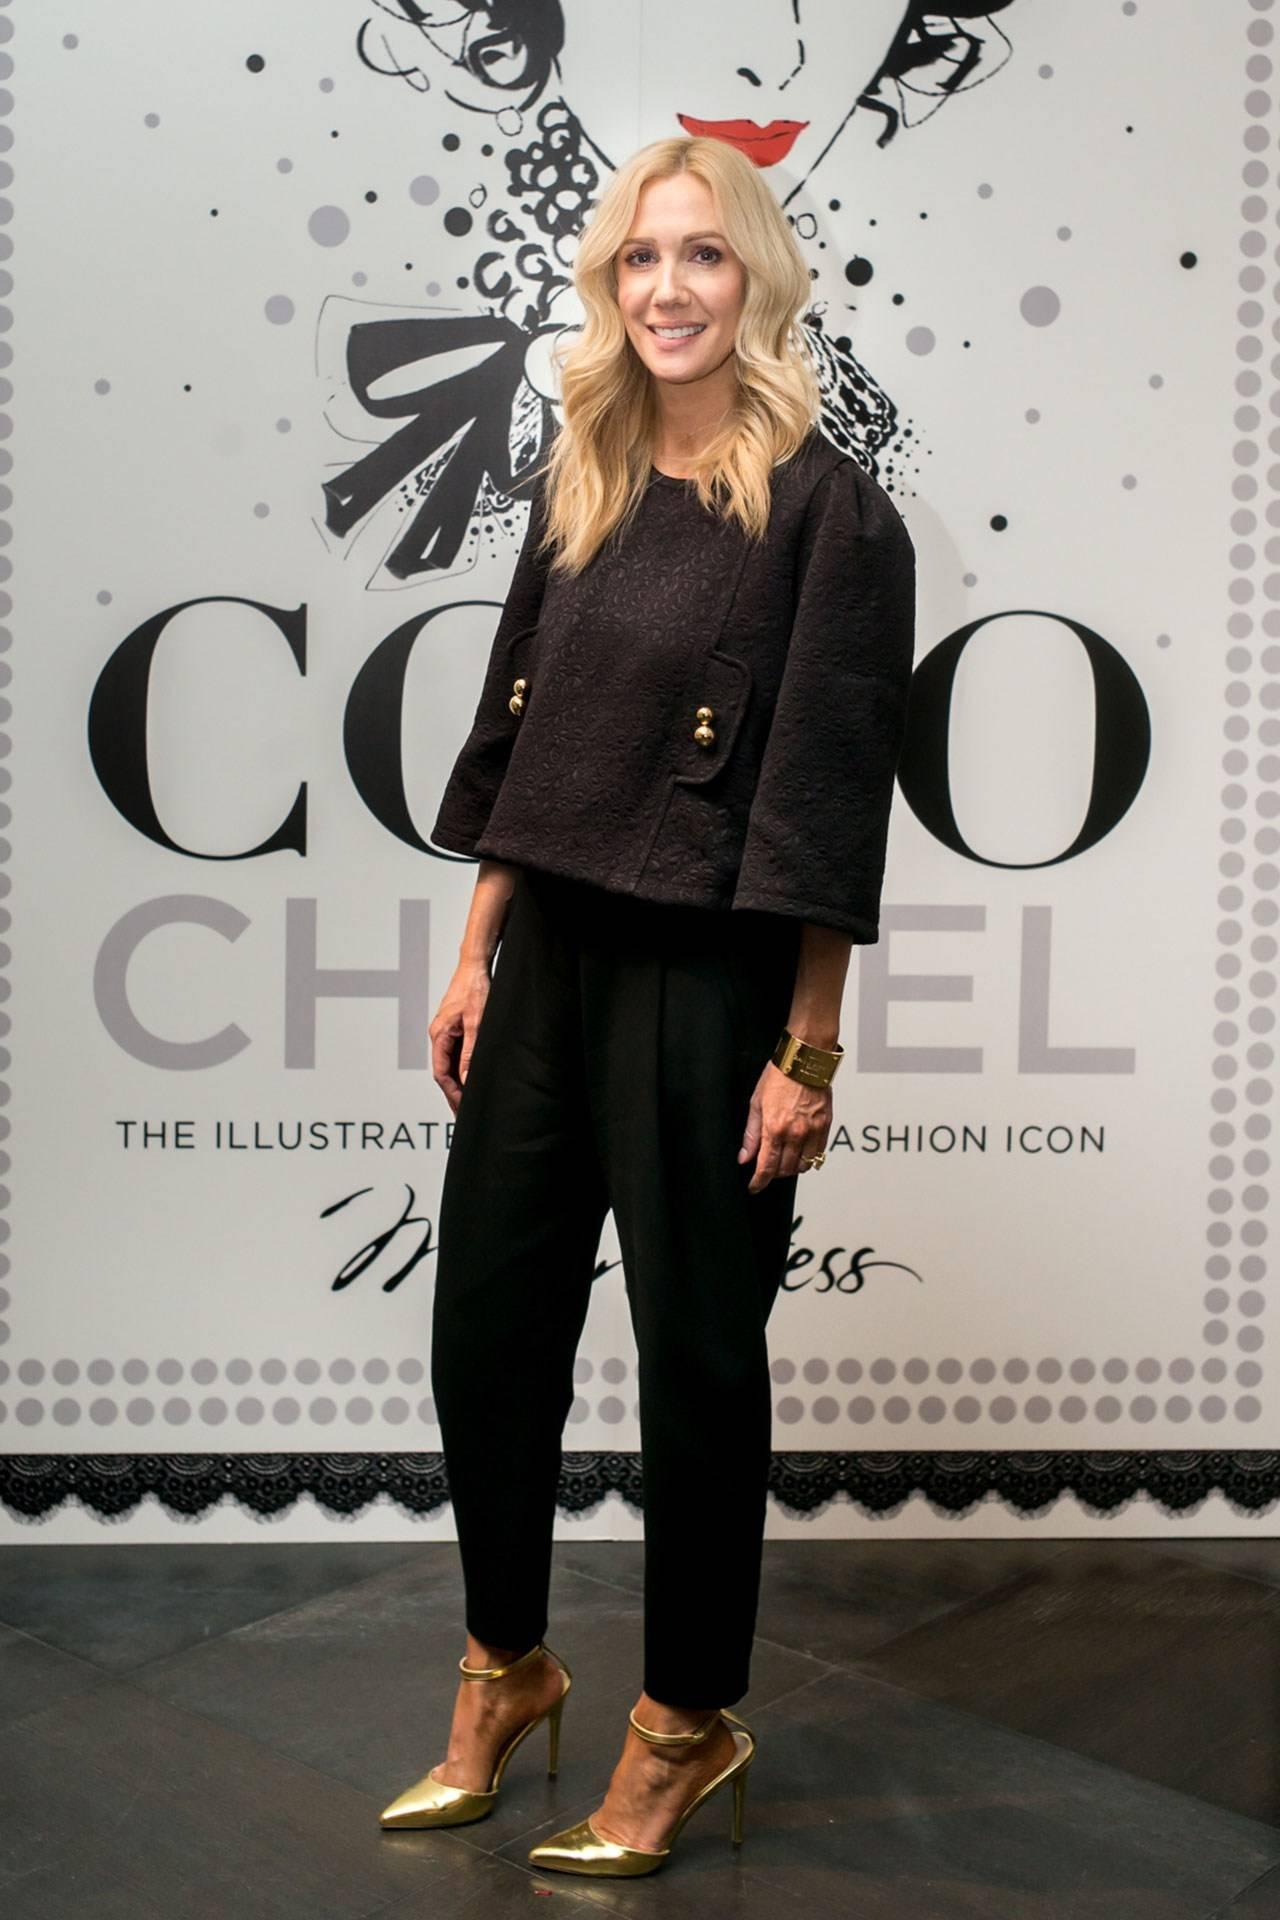 Caroline Fooks Design London Stephanie Dunning Interior